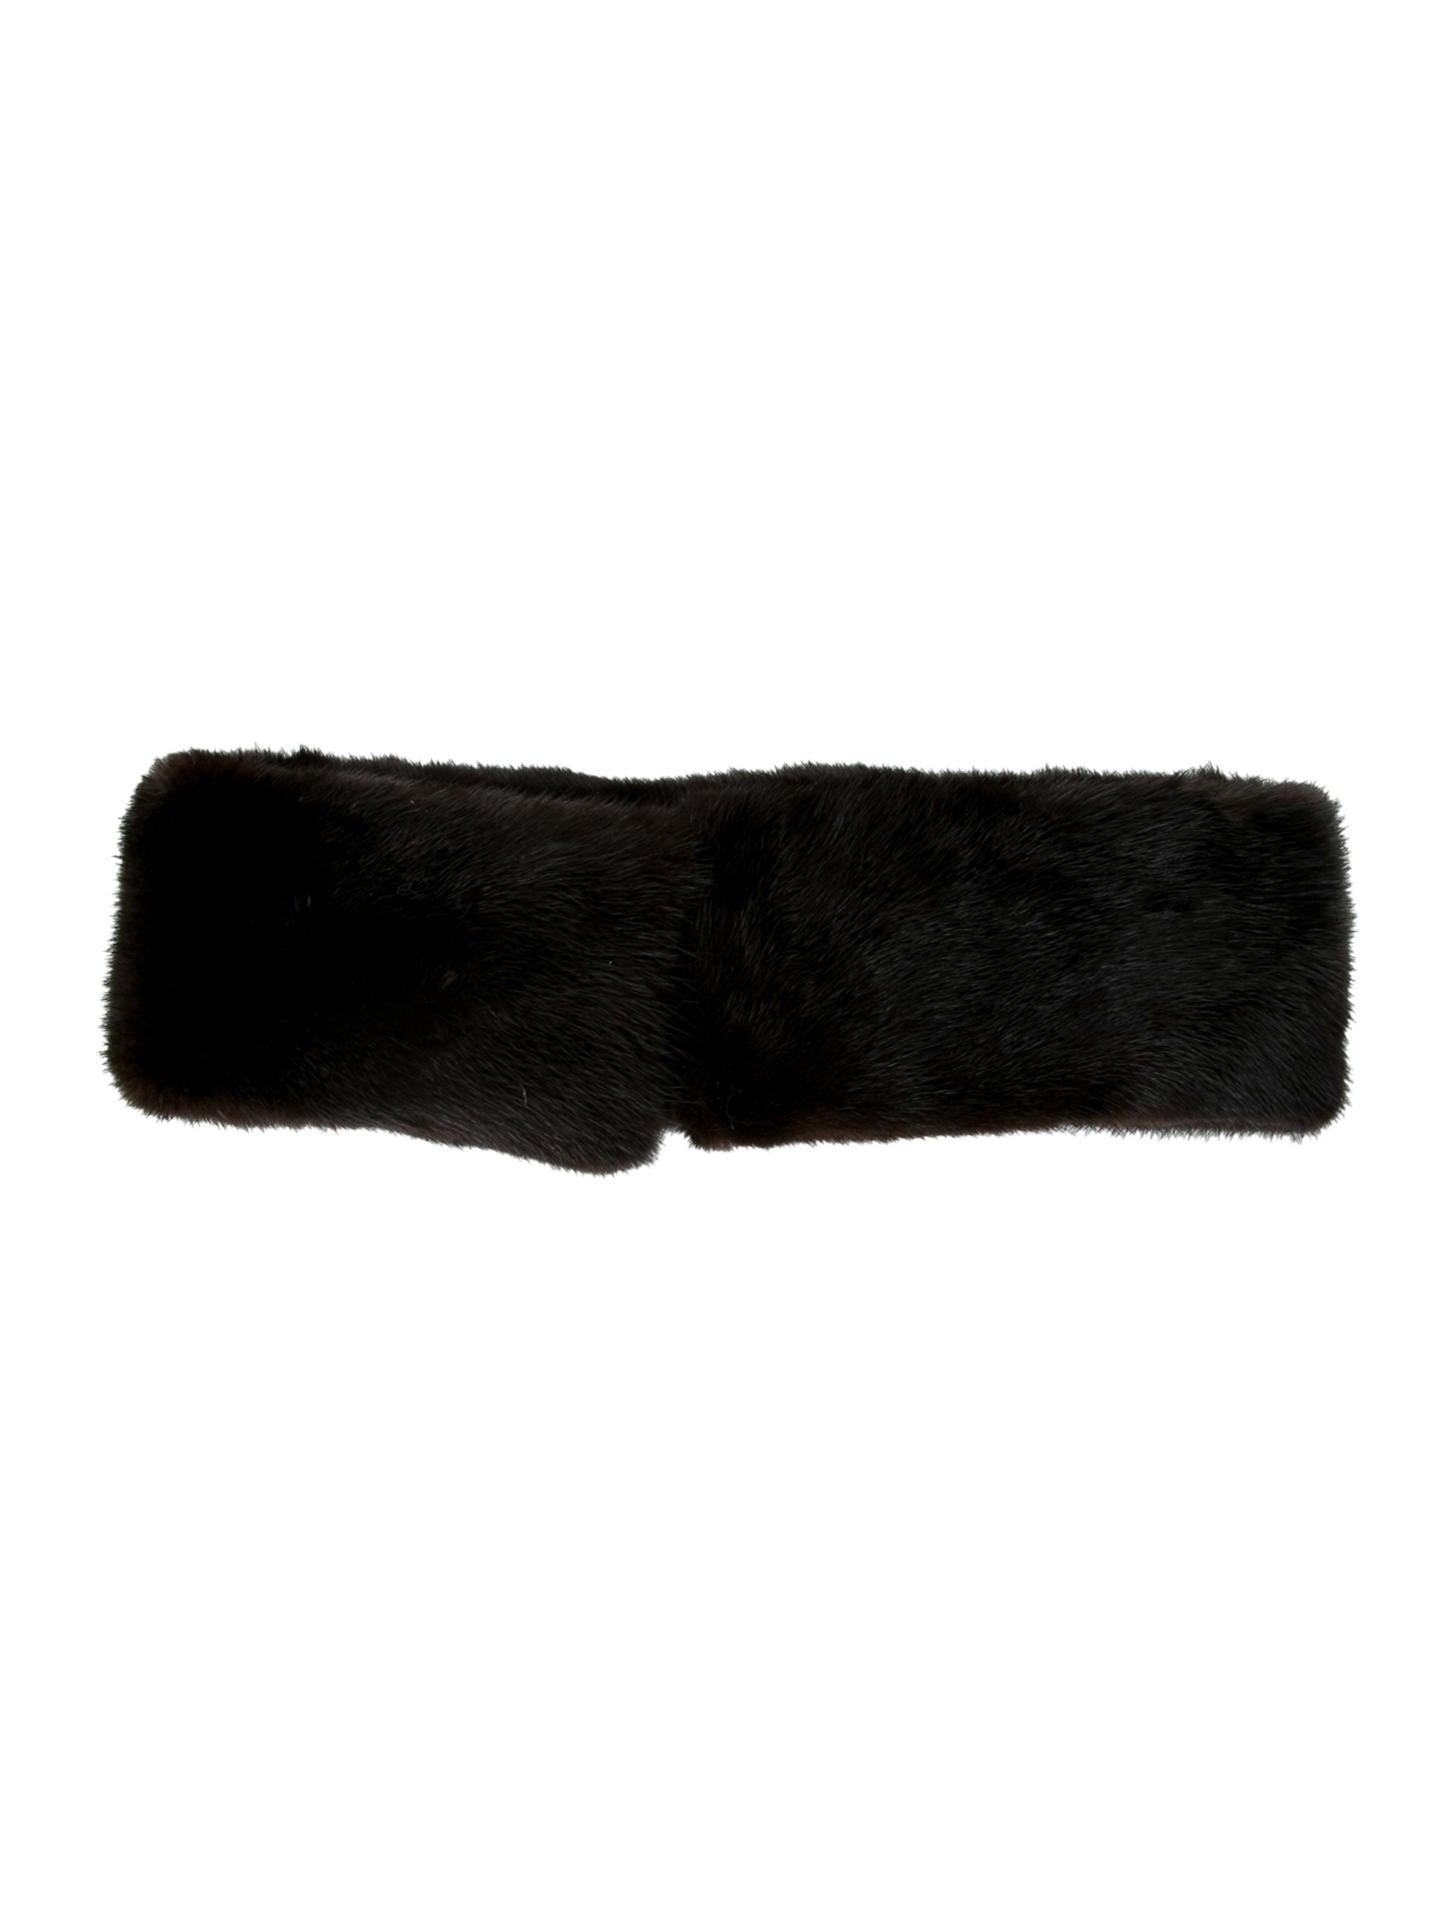 Adrienne Landau Mink Fur Headband - Accessories - ADR21814  f15a9e6b12c